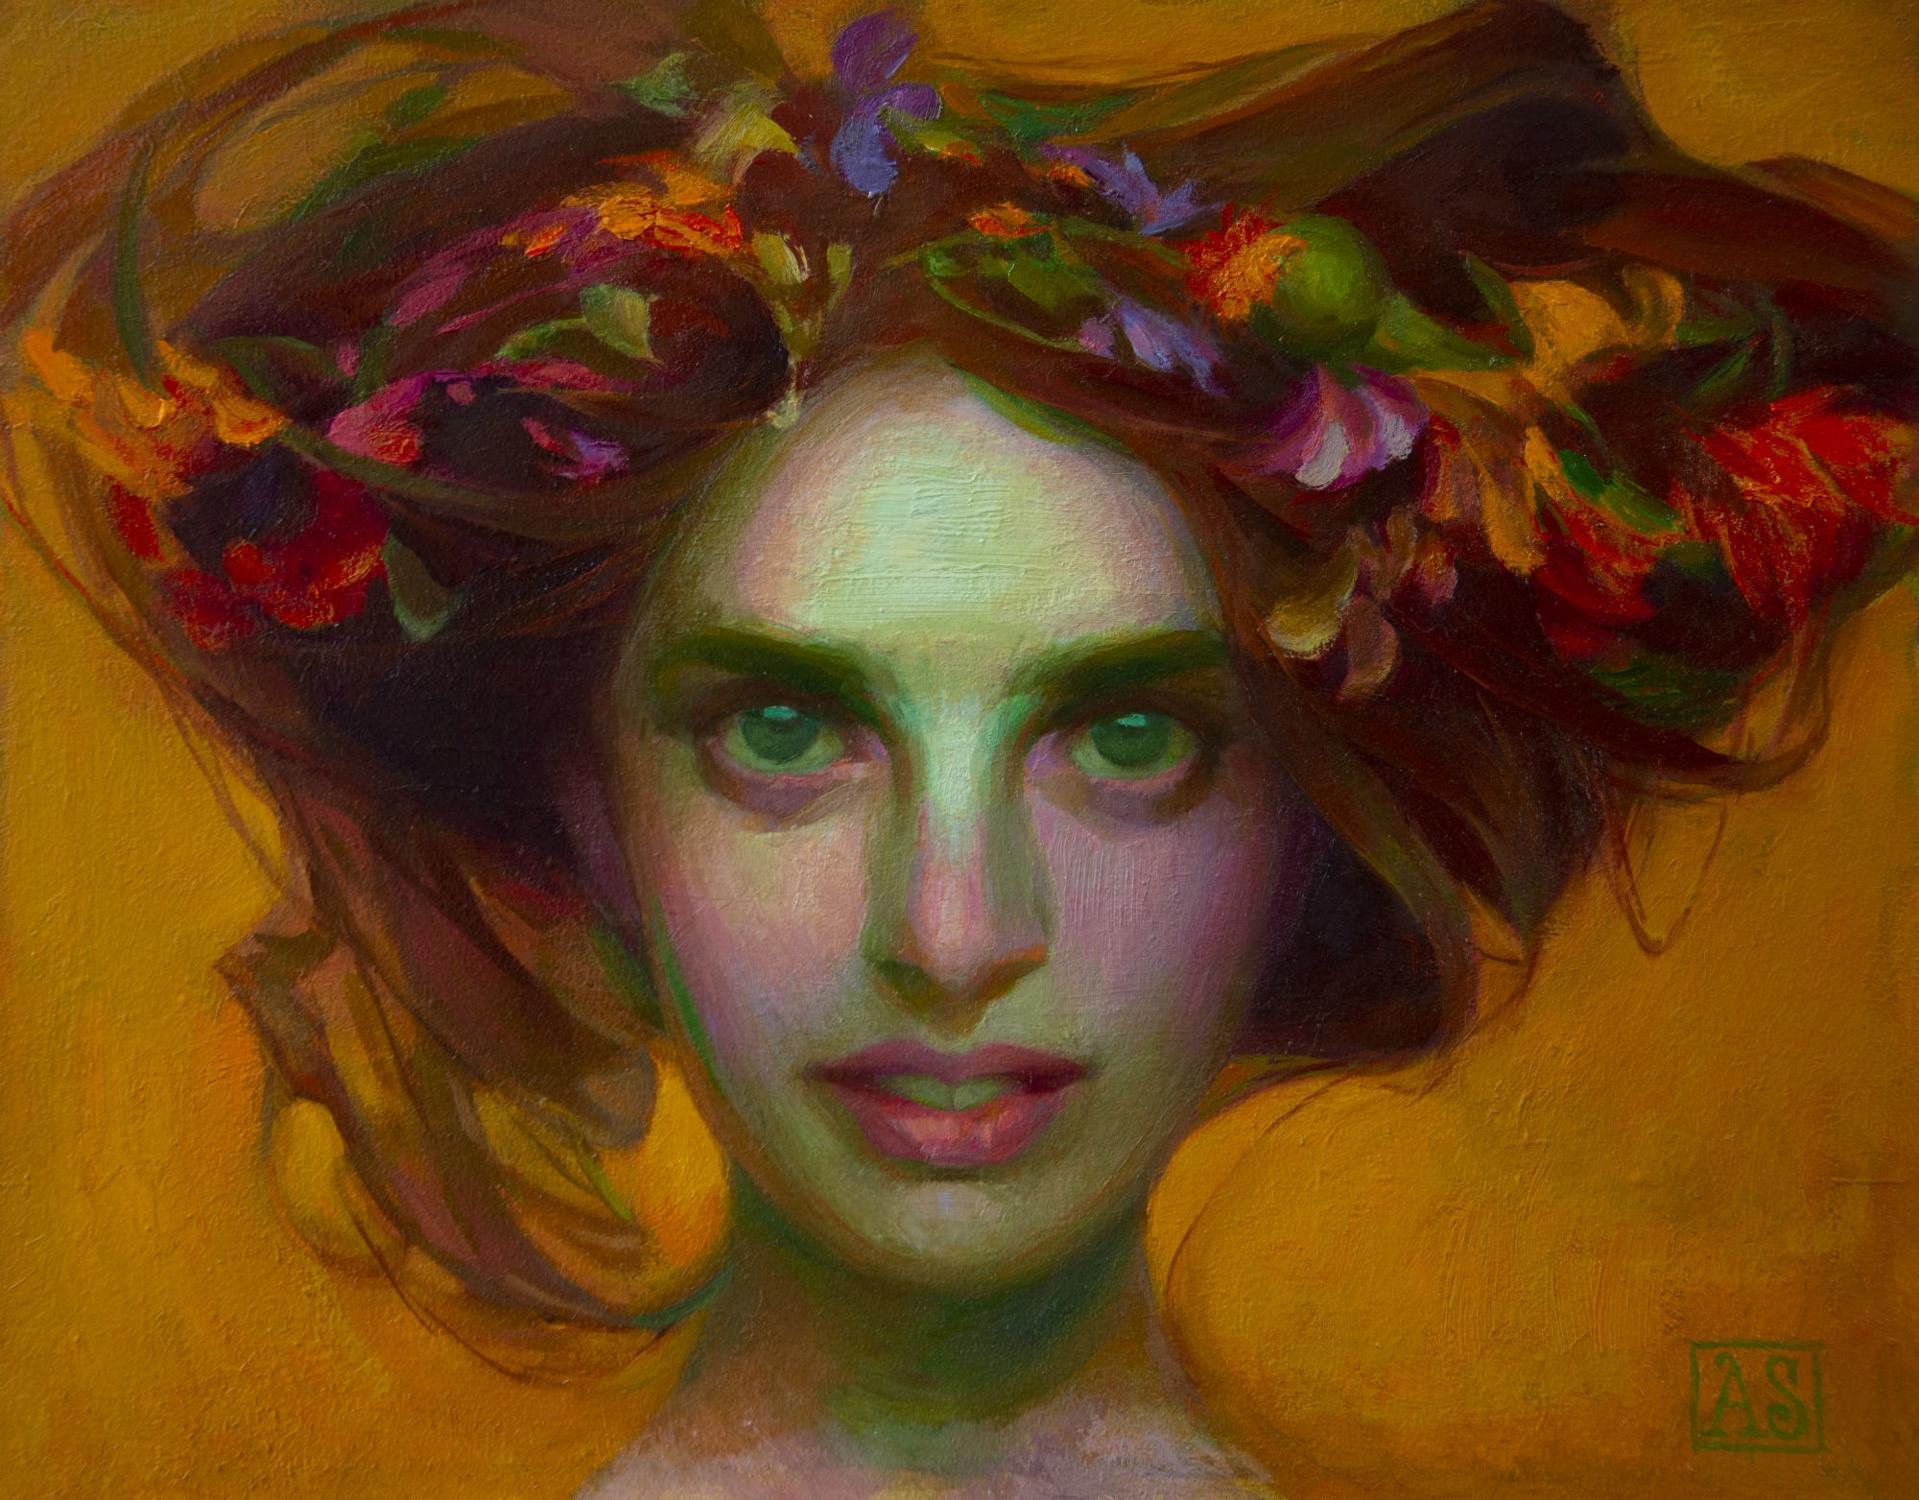 Enchantress by Adrienne Stein